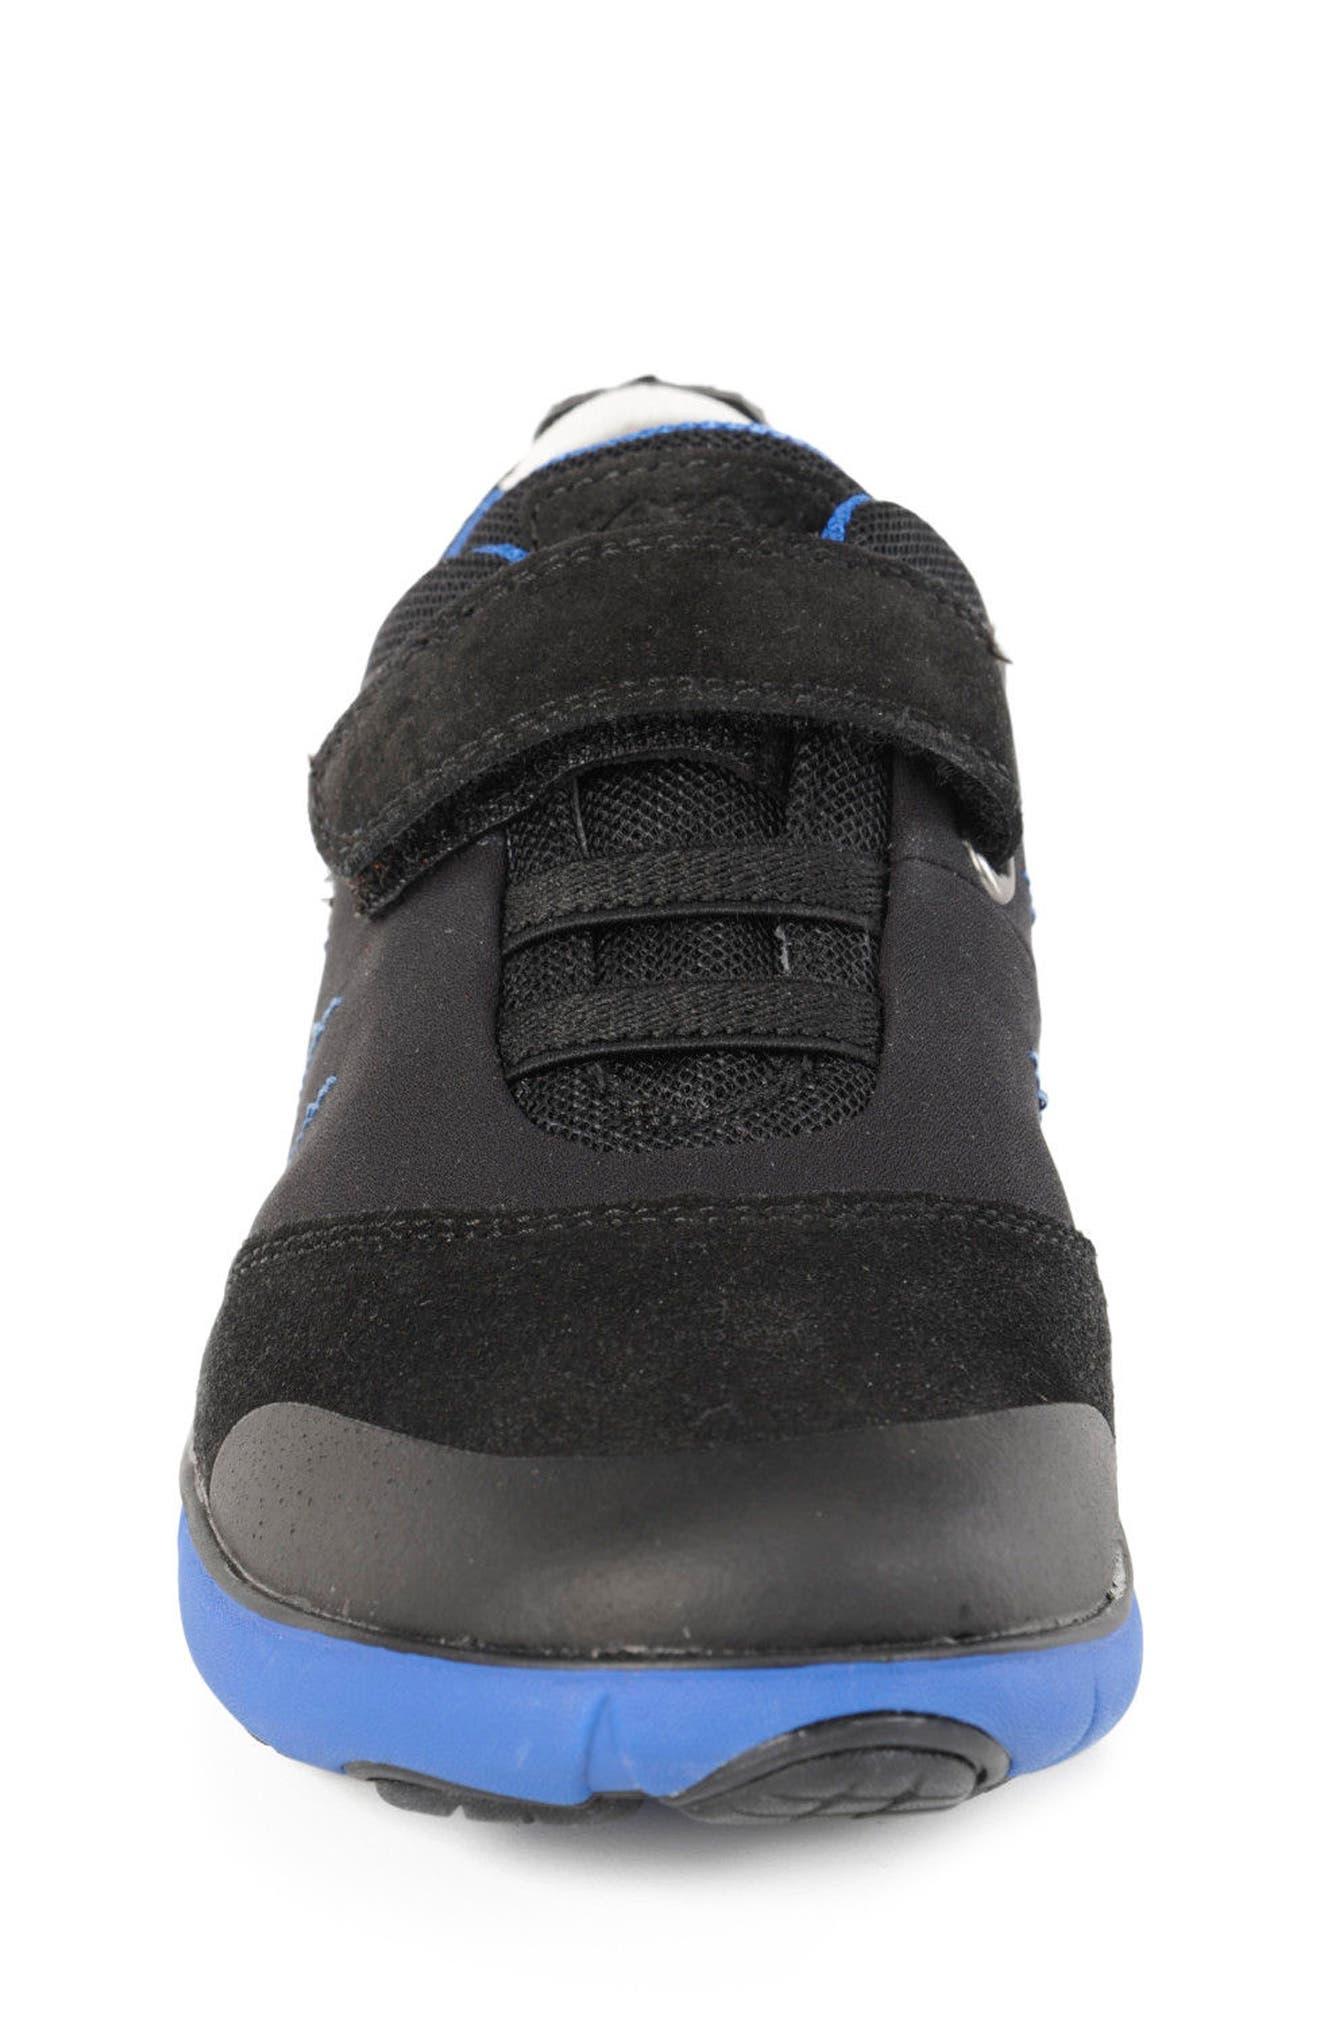 Alternate Image 4  - Geox Nebula Low Top Sneaker (Toddler, Little Kid & Big Kid)